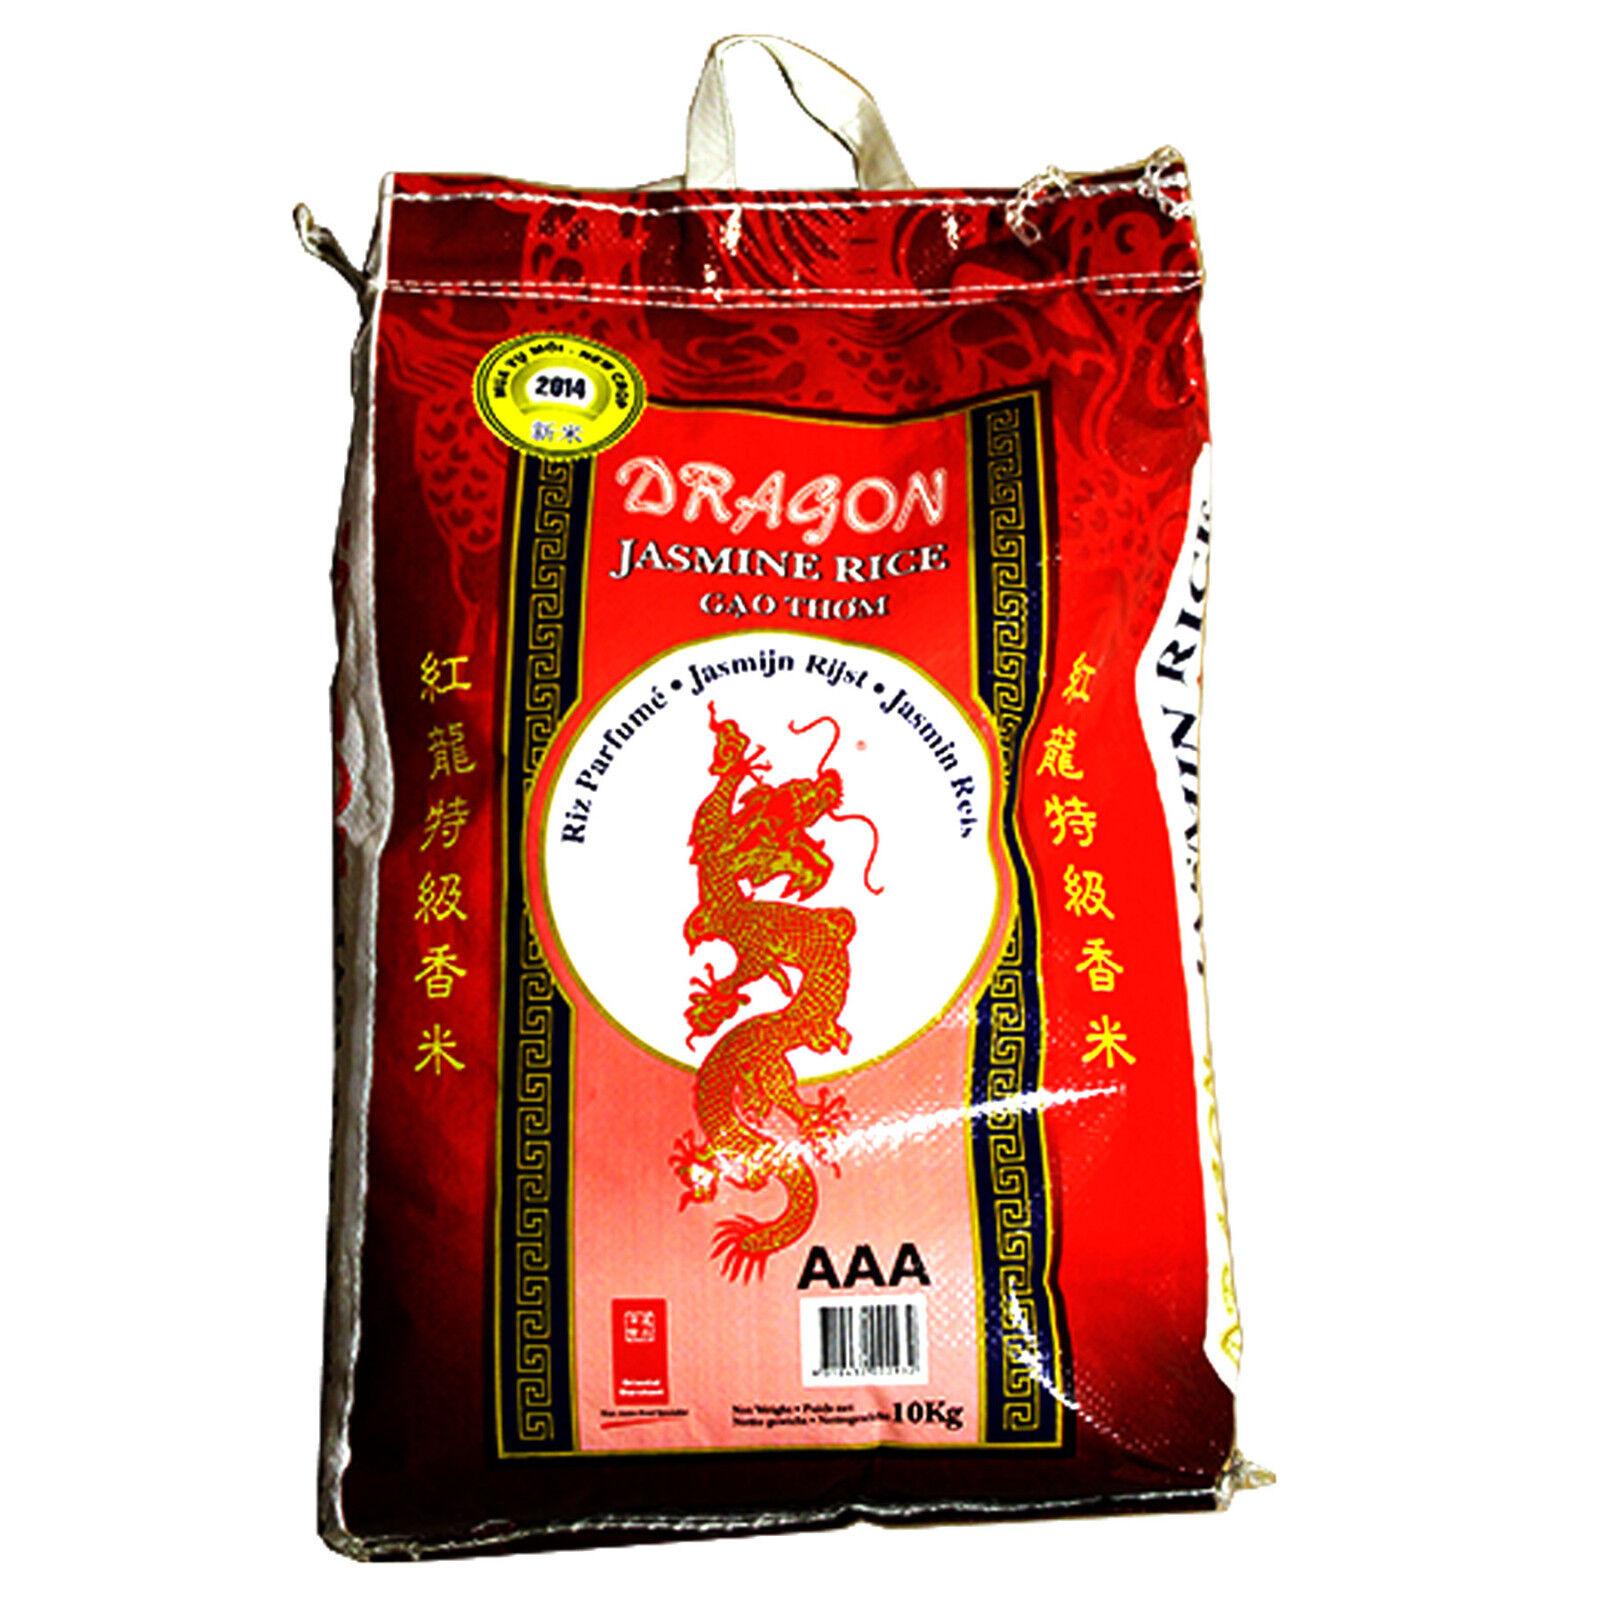 Duftreis 10 kg Red Dragon Jasminreis Premium Qualität AAA Reis 10 KG Jasmin Reis